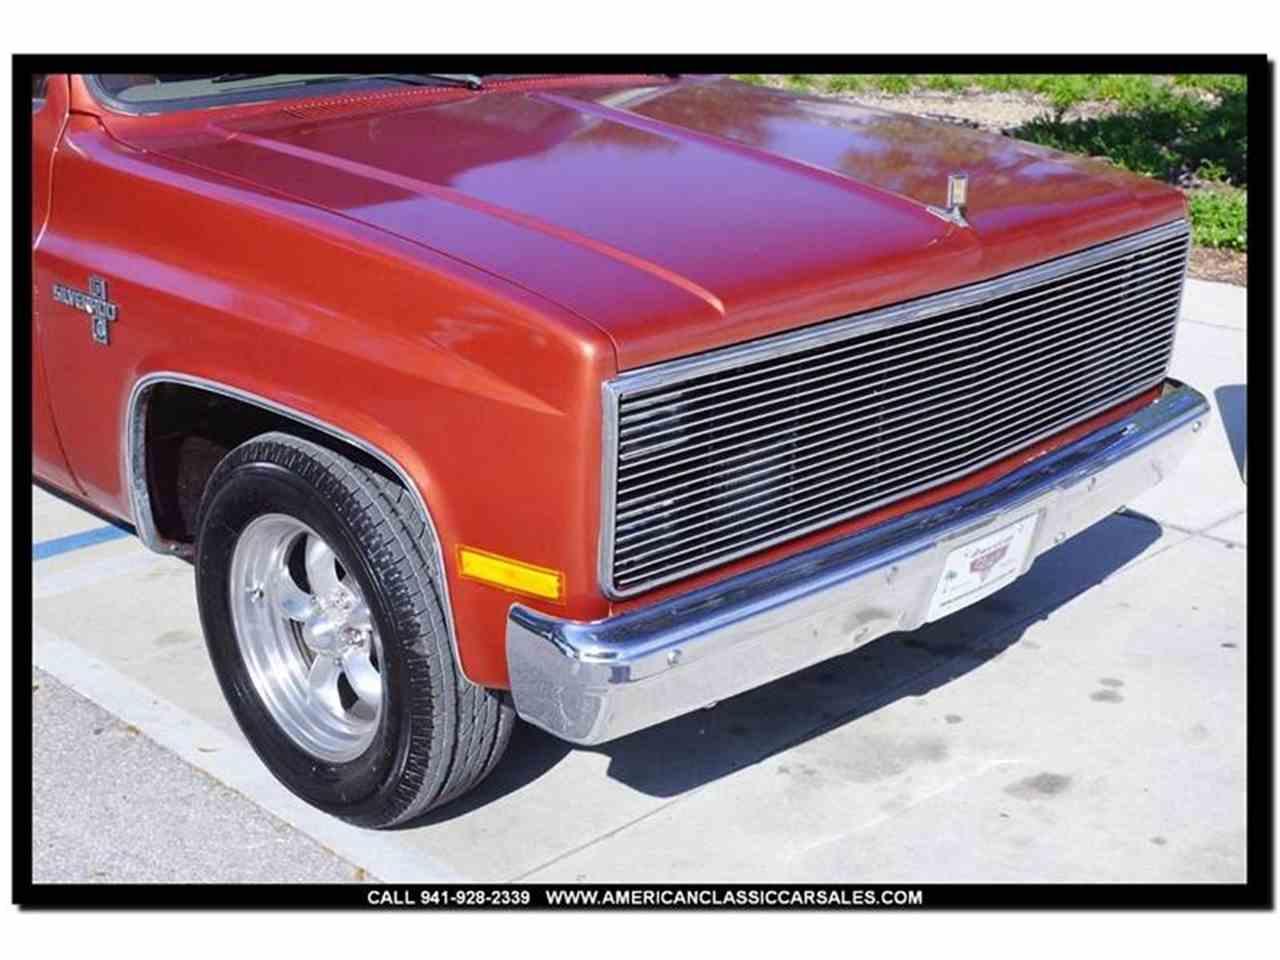 1987 Chevrolet C10 for Sale | ClassicCars.com | CC-1026251